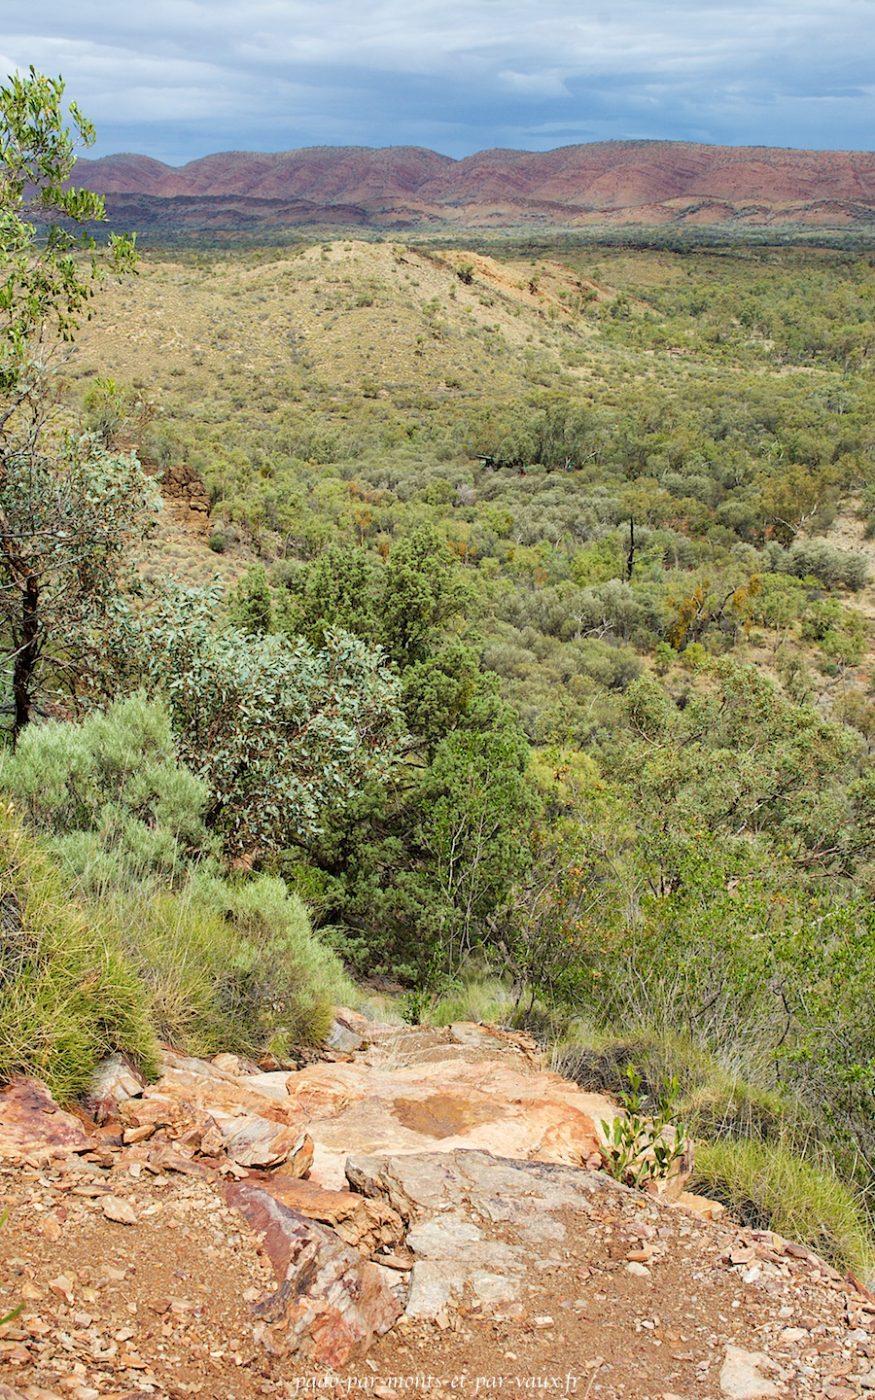 Serpentine gorge - lookout